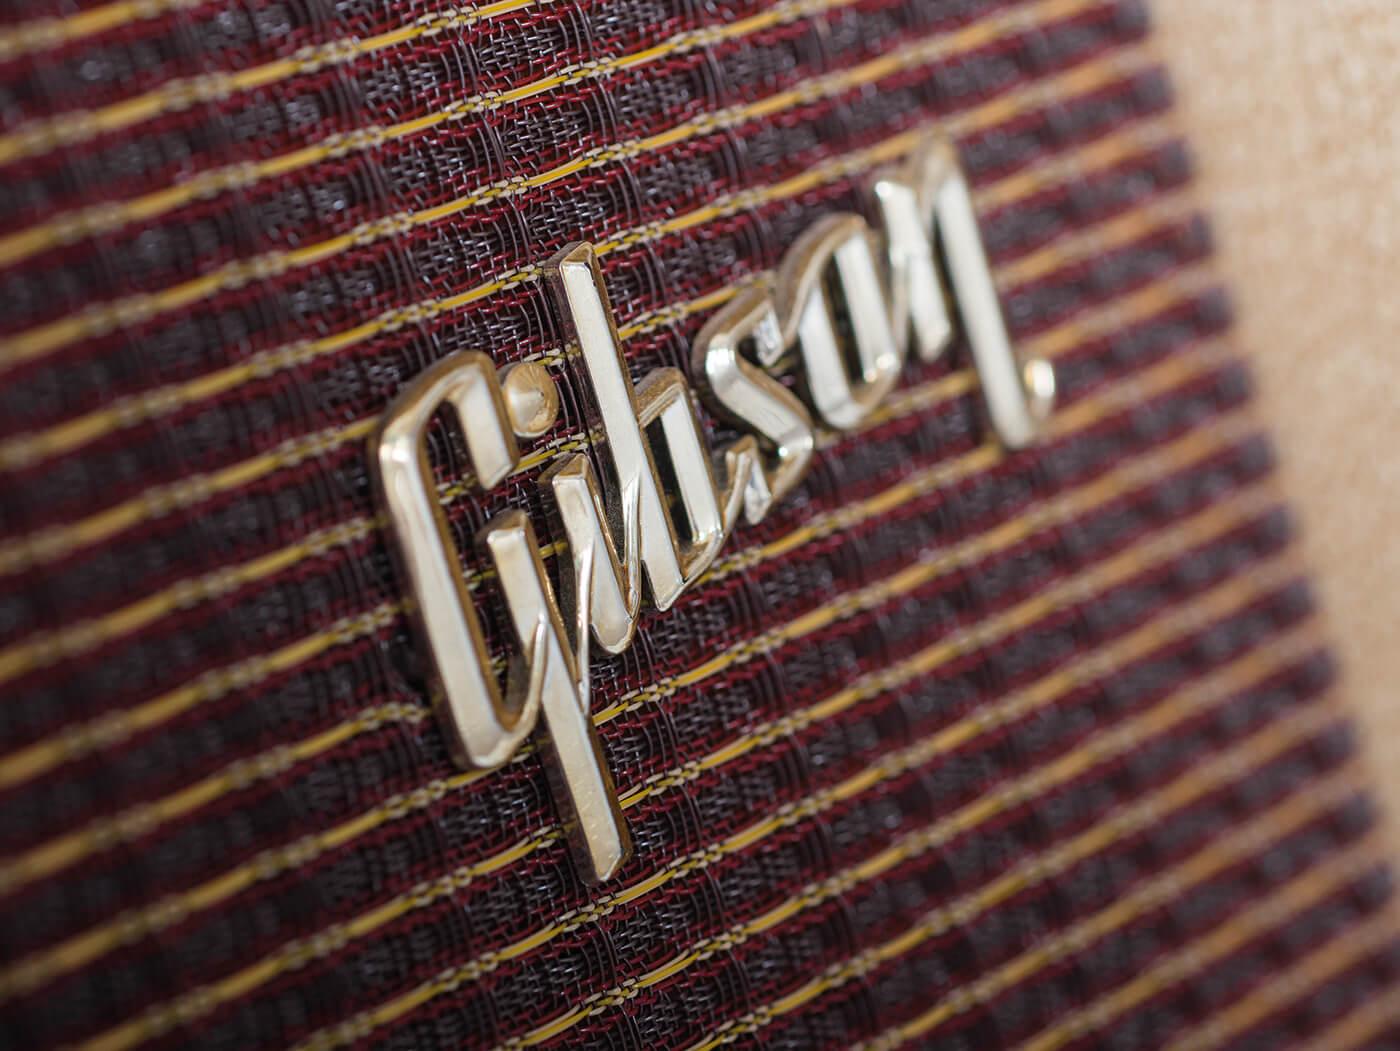 Gibson Skylark logo